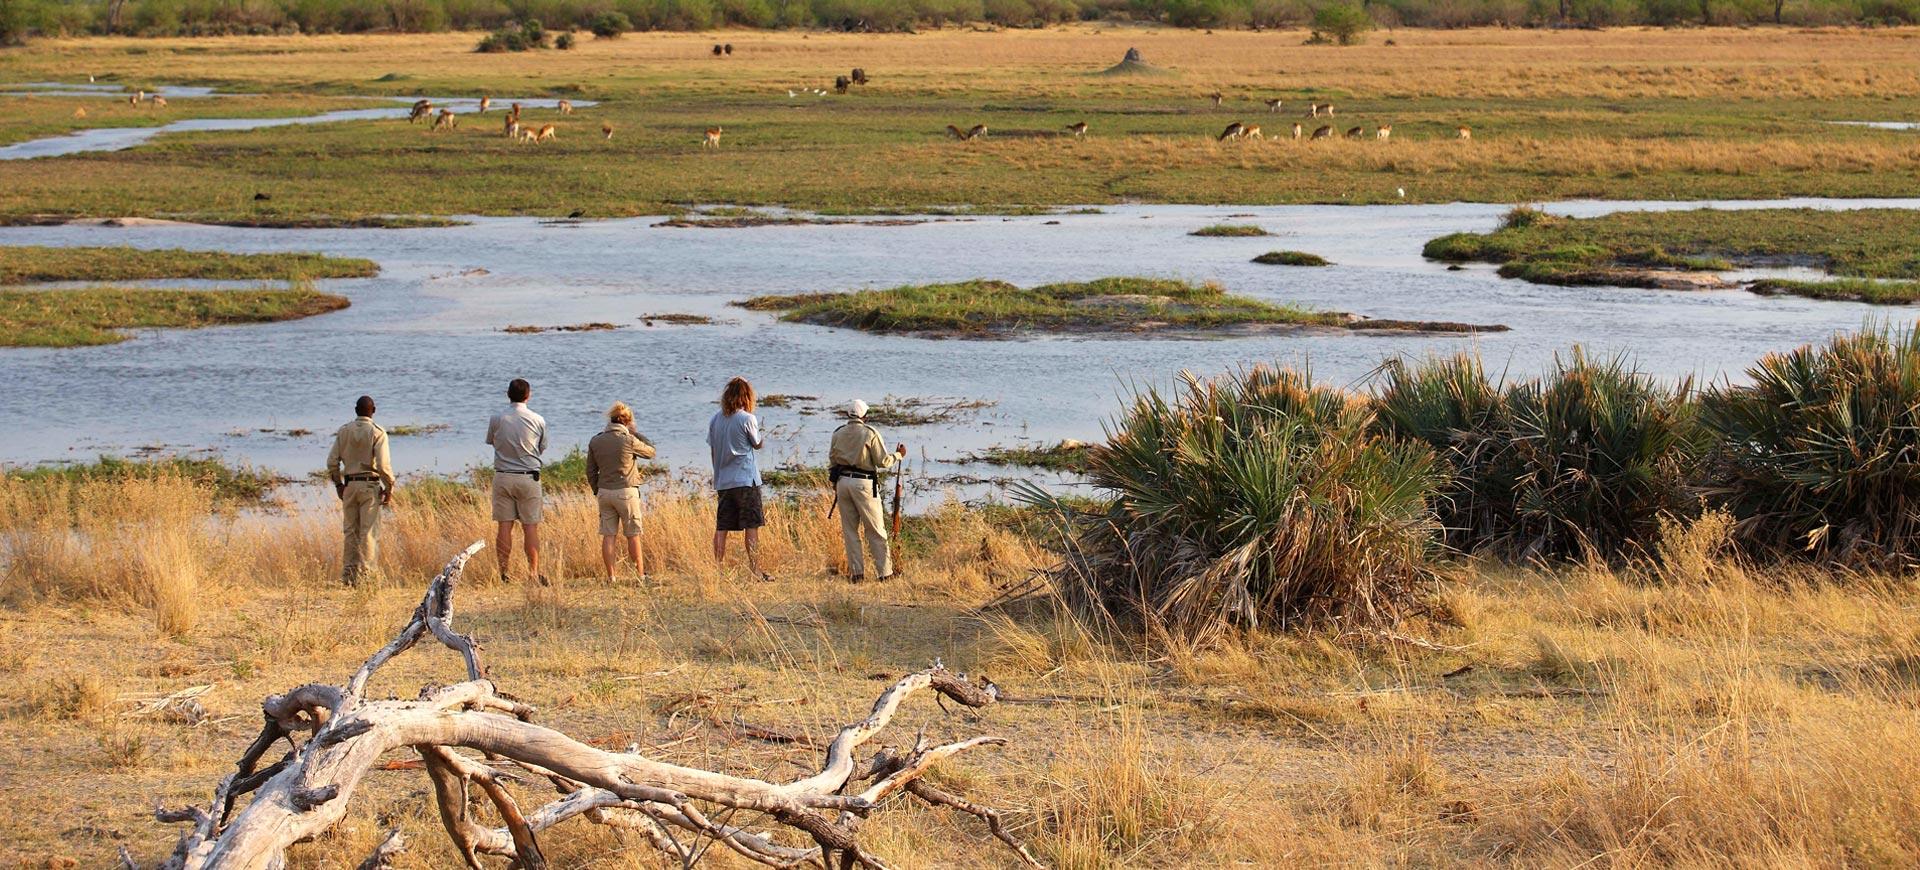 Okavango Walking Safari